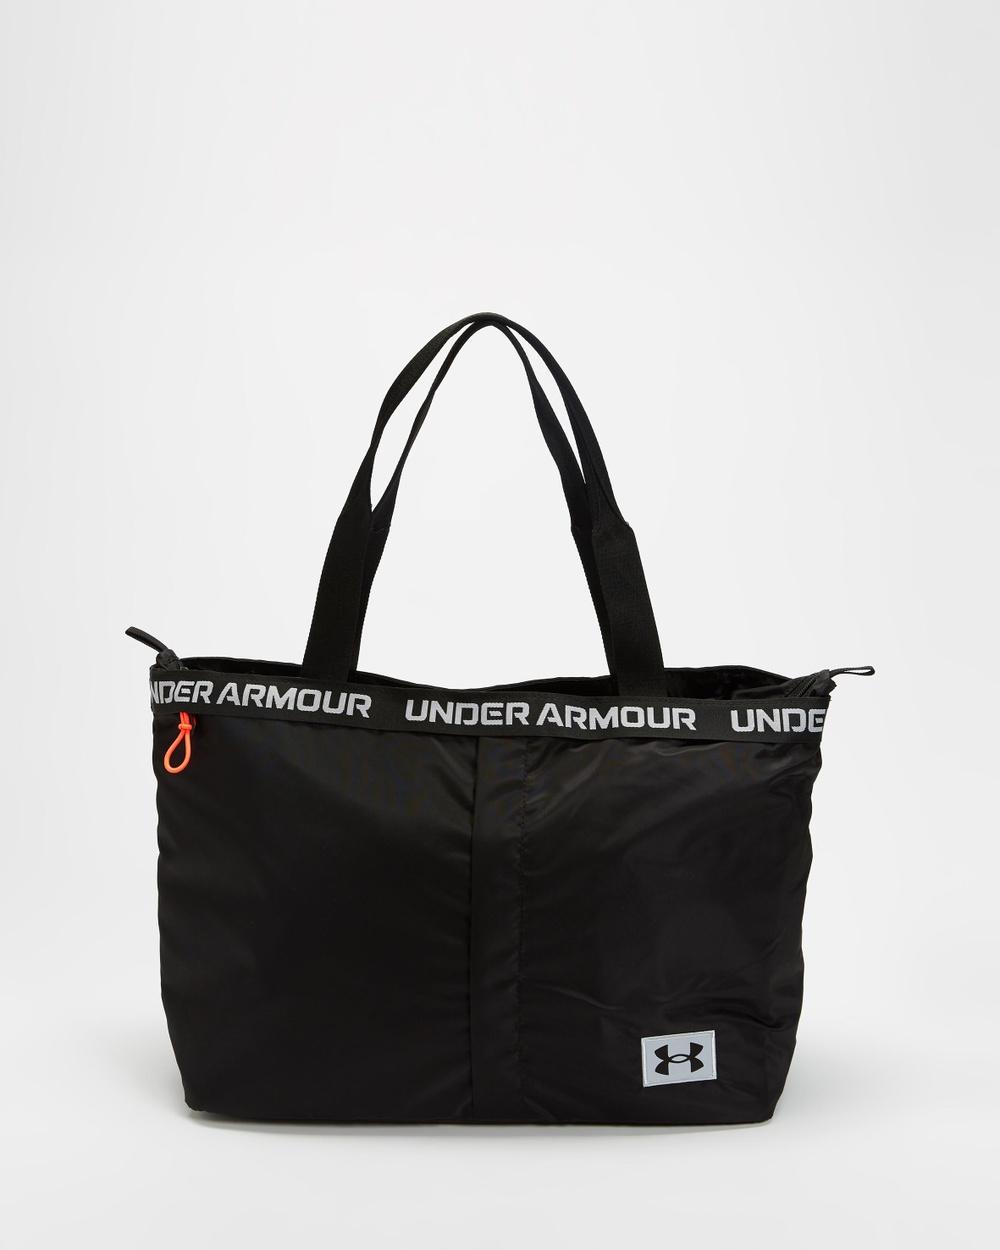 Under Armour Essentials Tote Bags Black, Mod Grey & Black